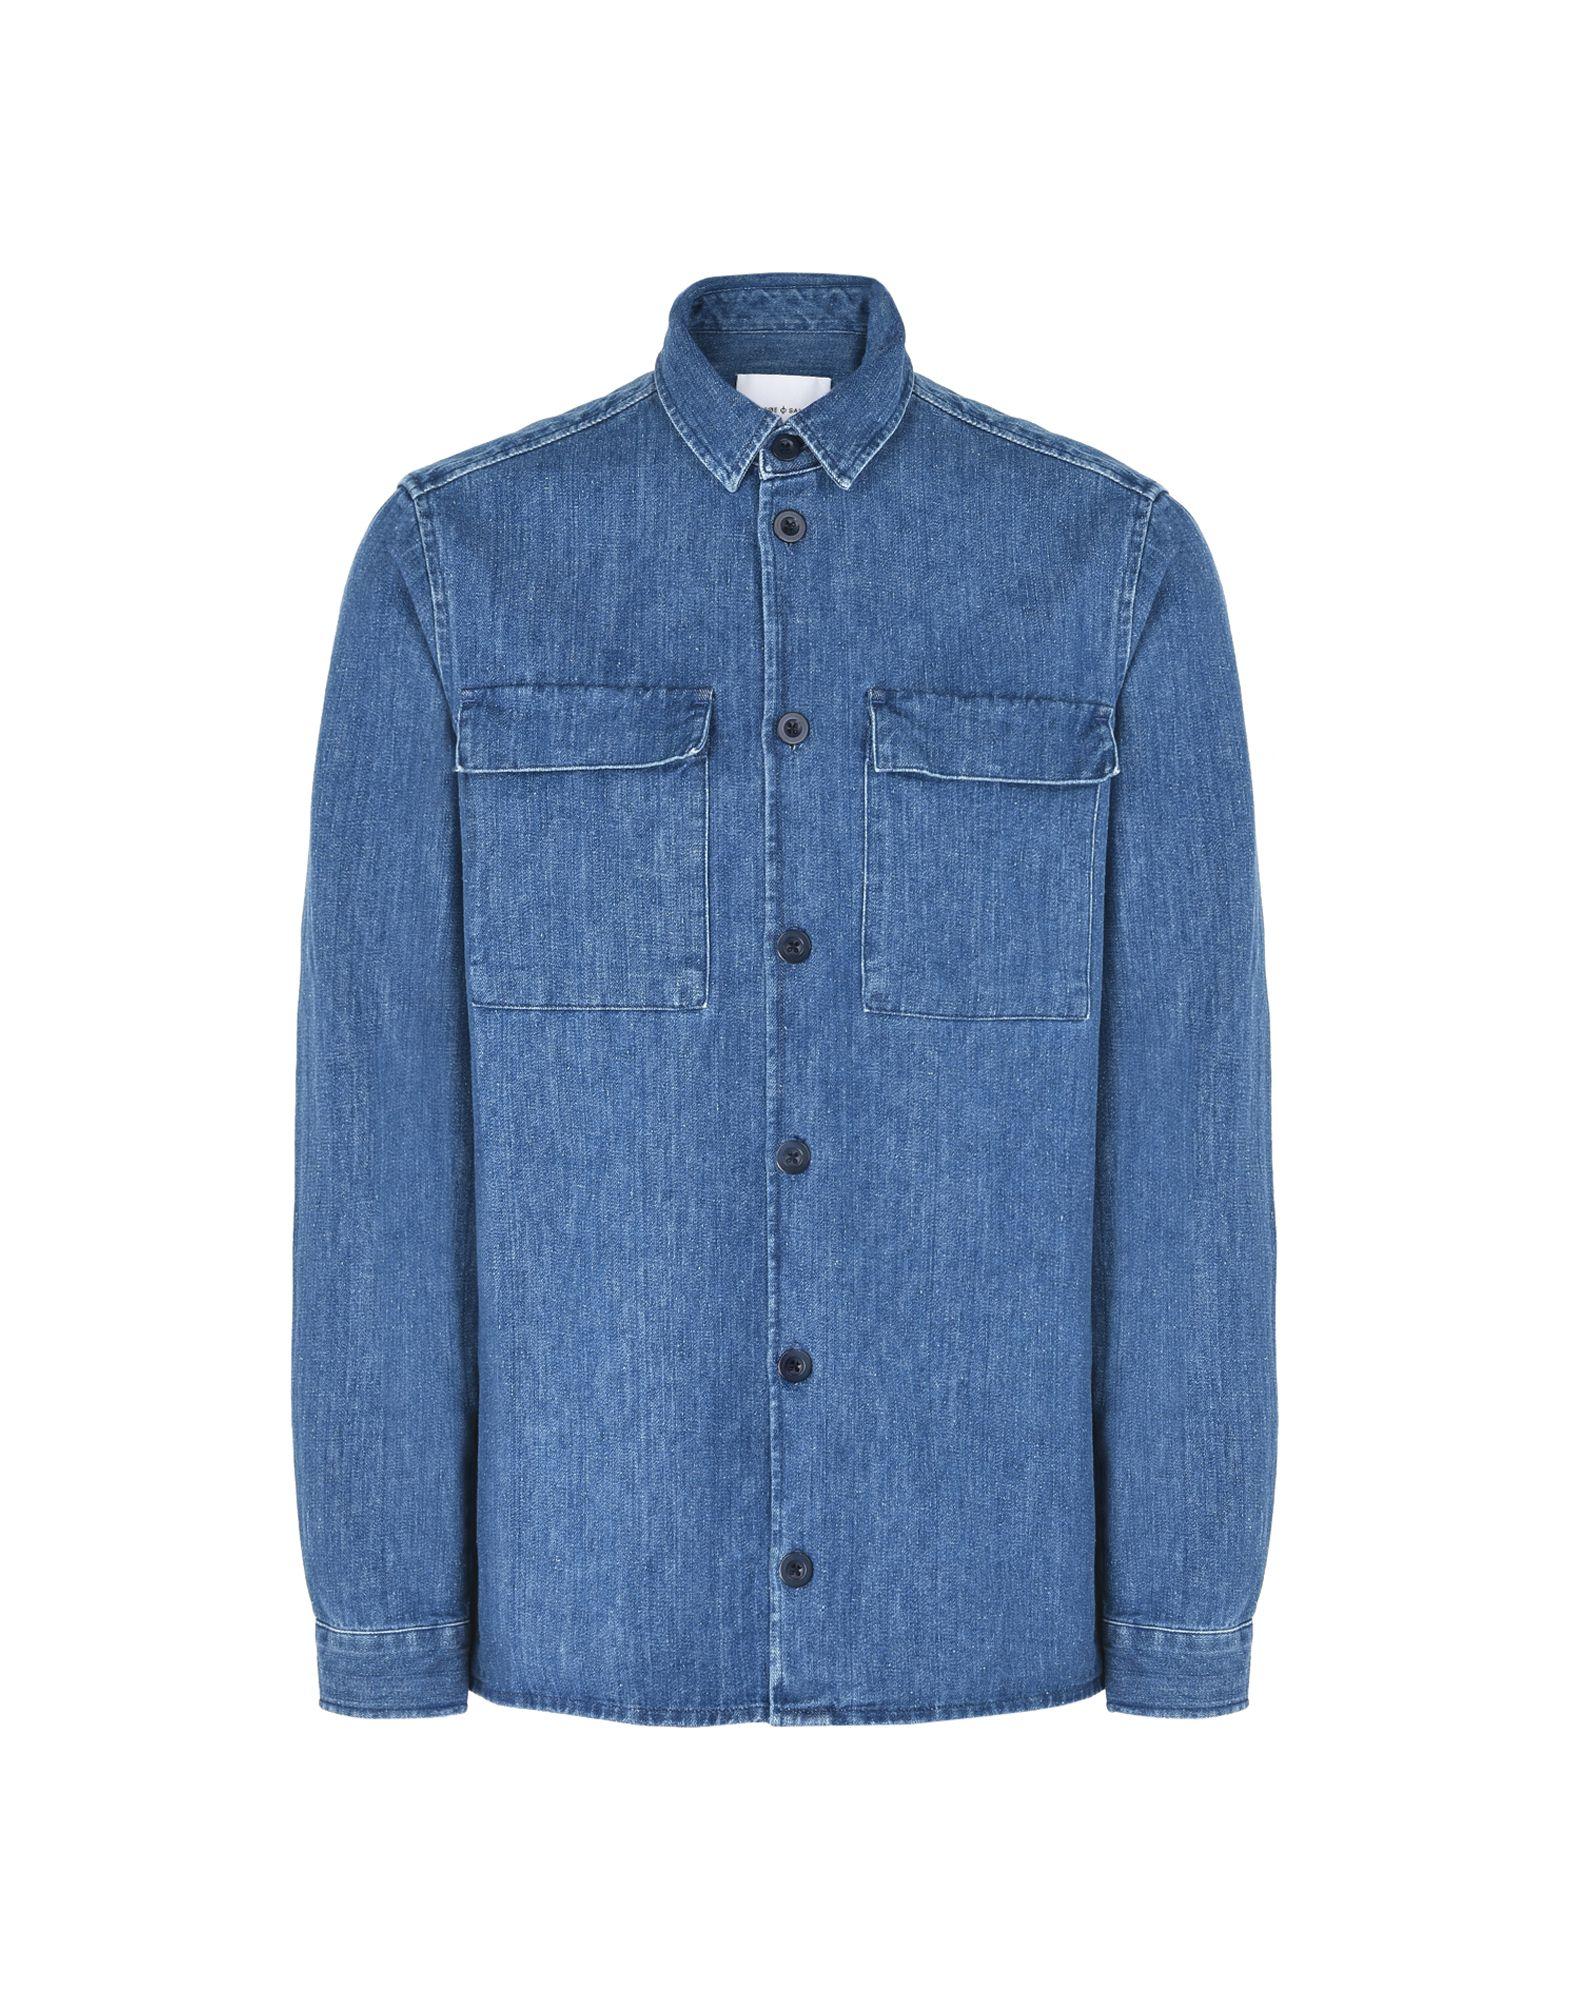 Camicia Jeans Samsøe Φ Samsøe Marlon Nr  9526 - Uomo - Acquista online su